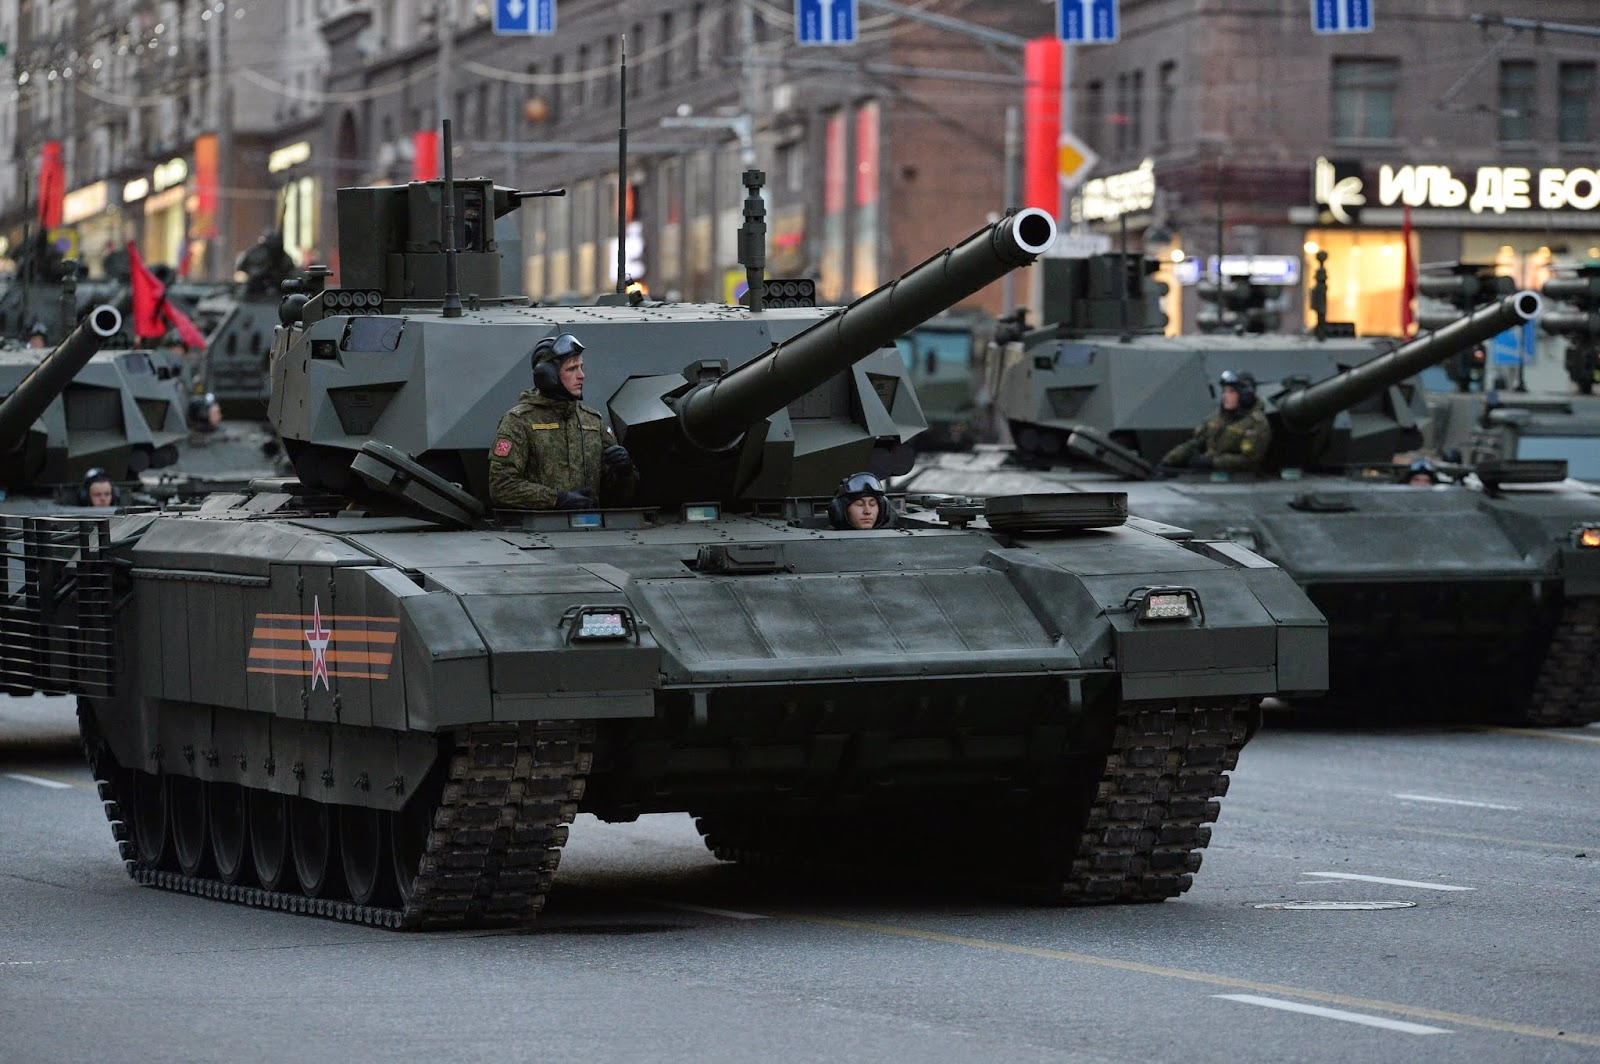 2018, Rusia Akan Dapatkan 100 Tank Armata T-14 Produksi Massal Pertama